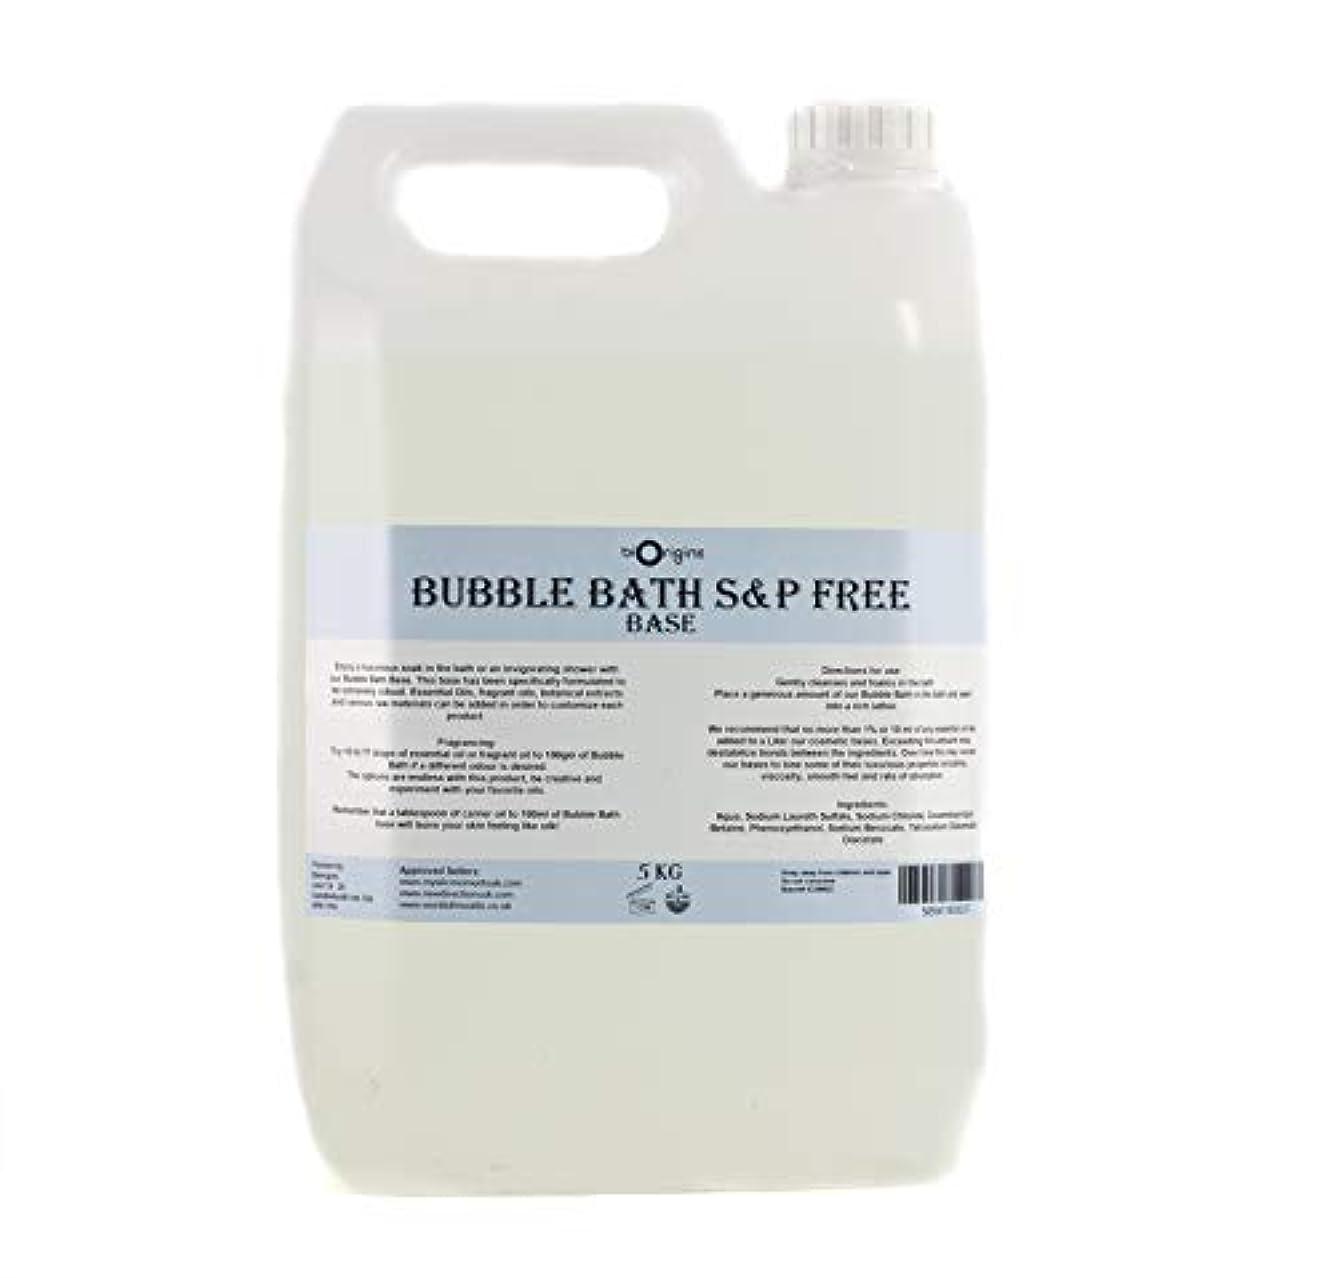 Bubble Bath Base - SLS & Paraben Free - 5Kg